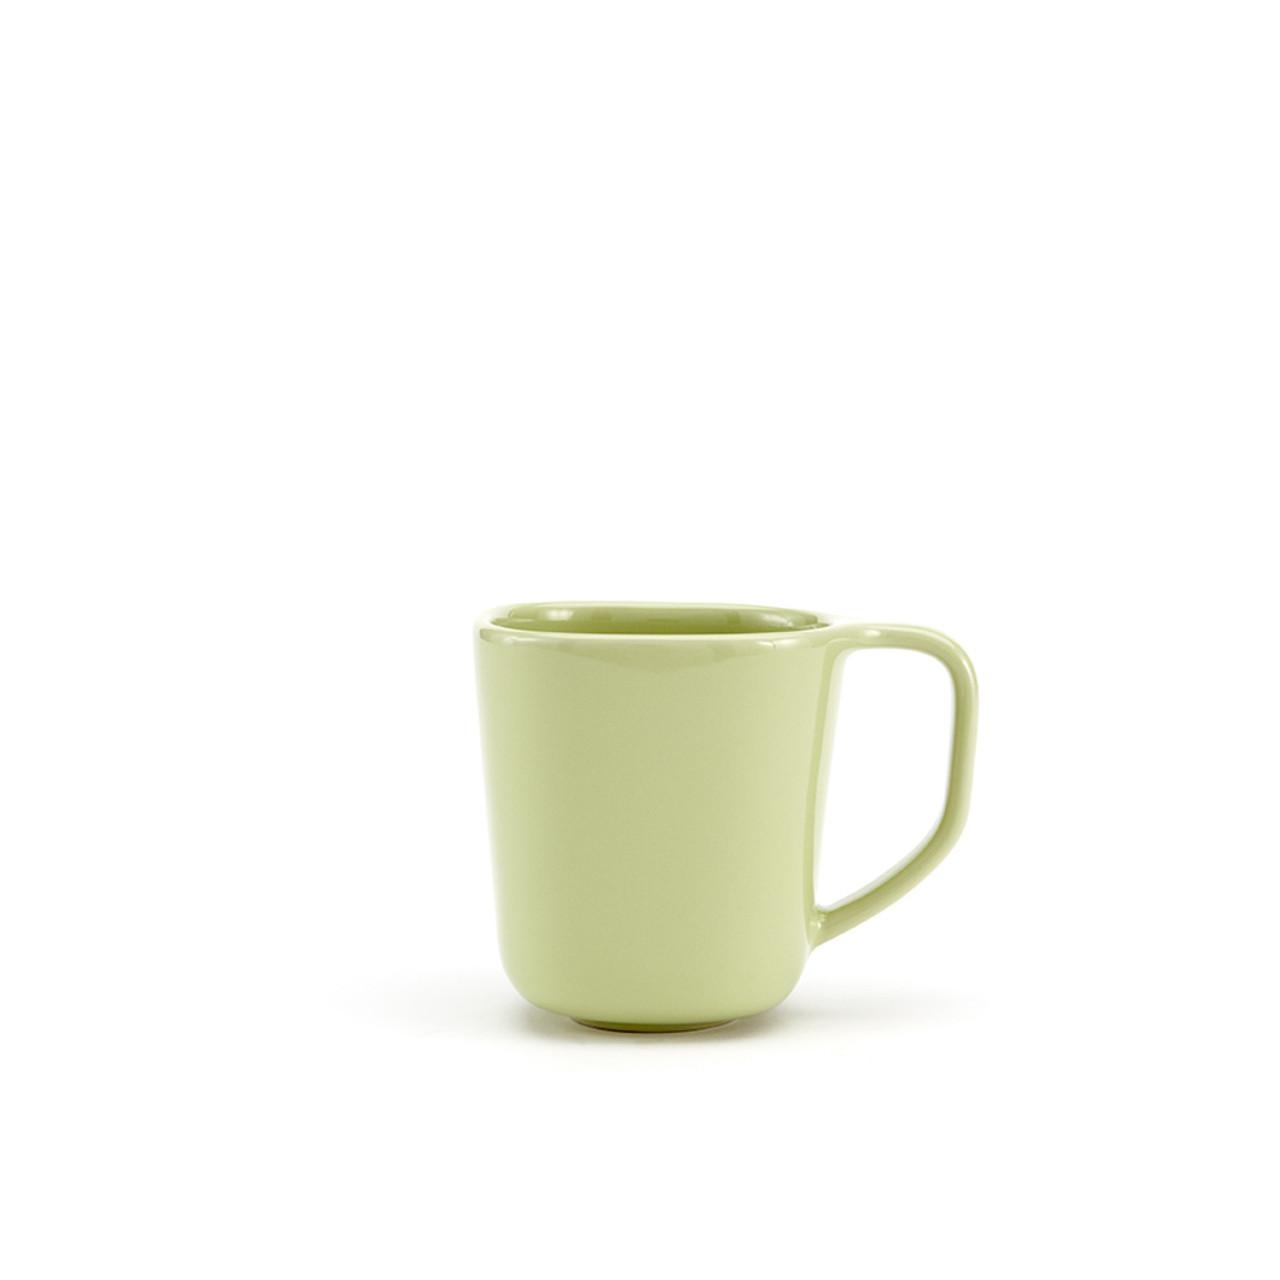 Karo - Light Green Dinnerware set 16pc